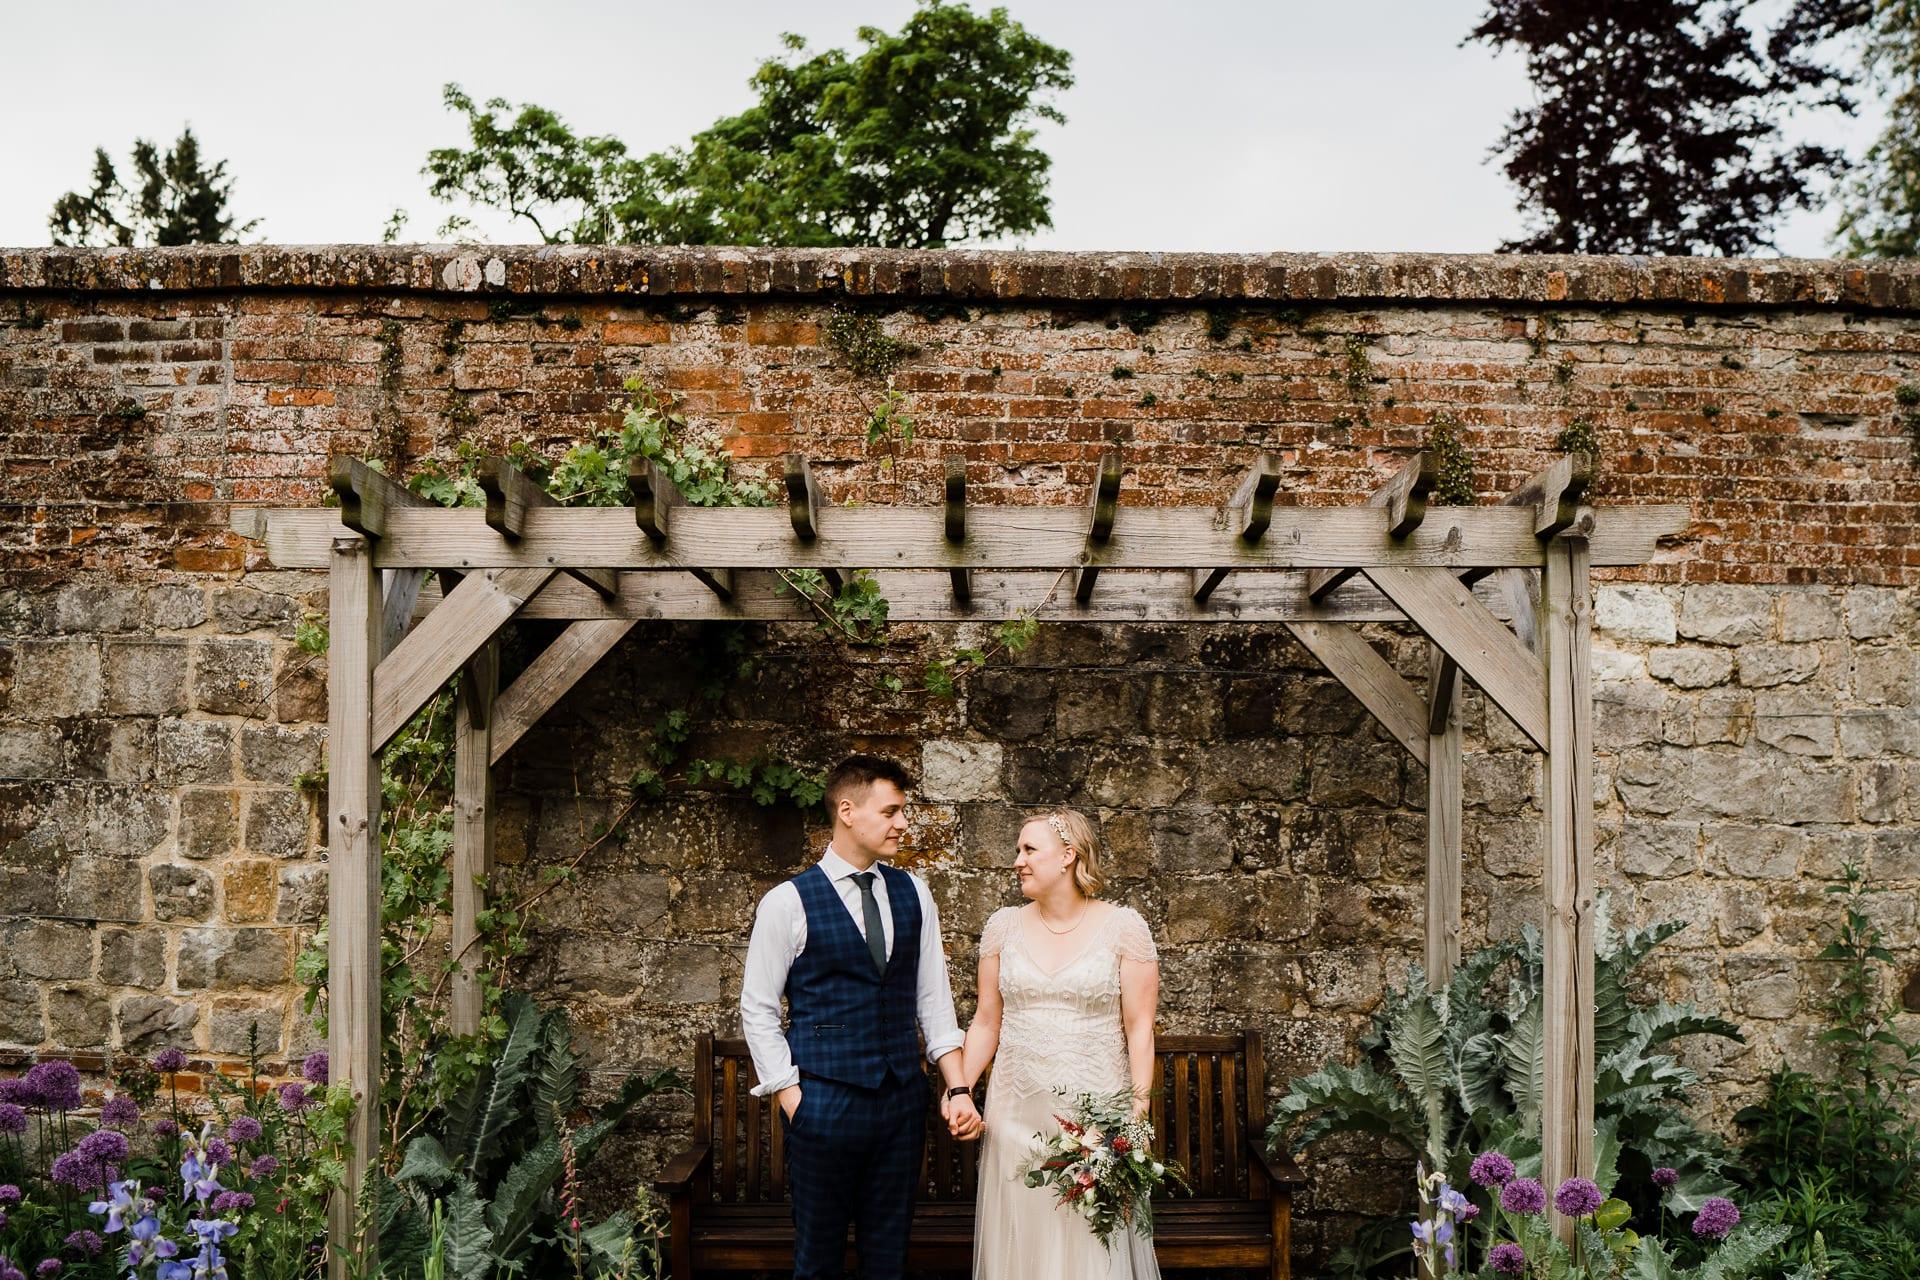 Wedding photography under the gazebo at Farnham Castle